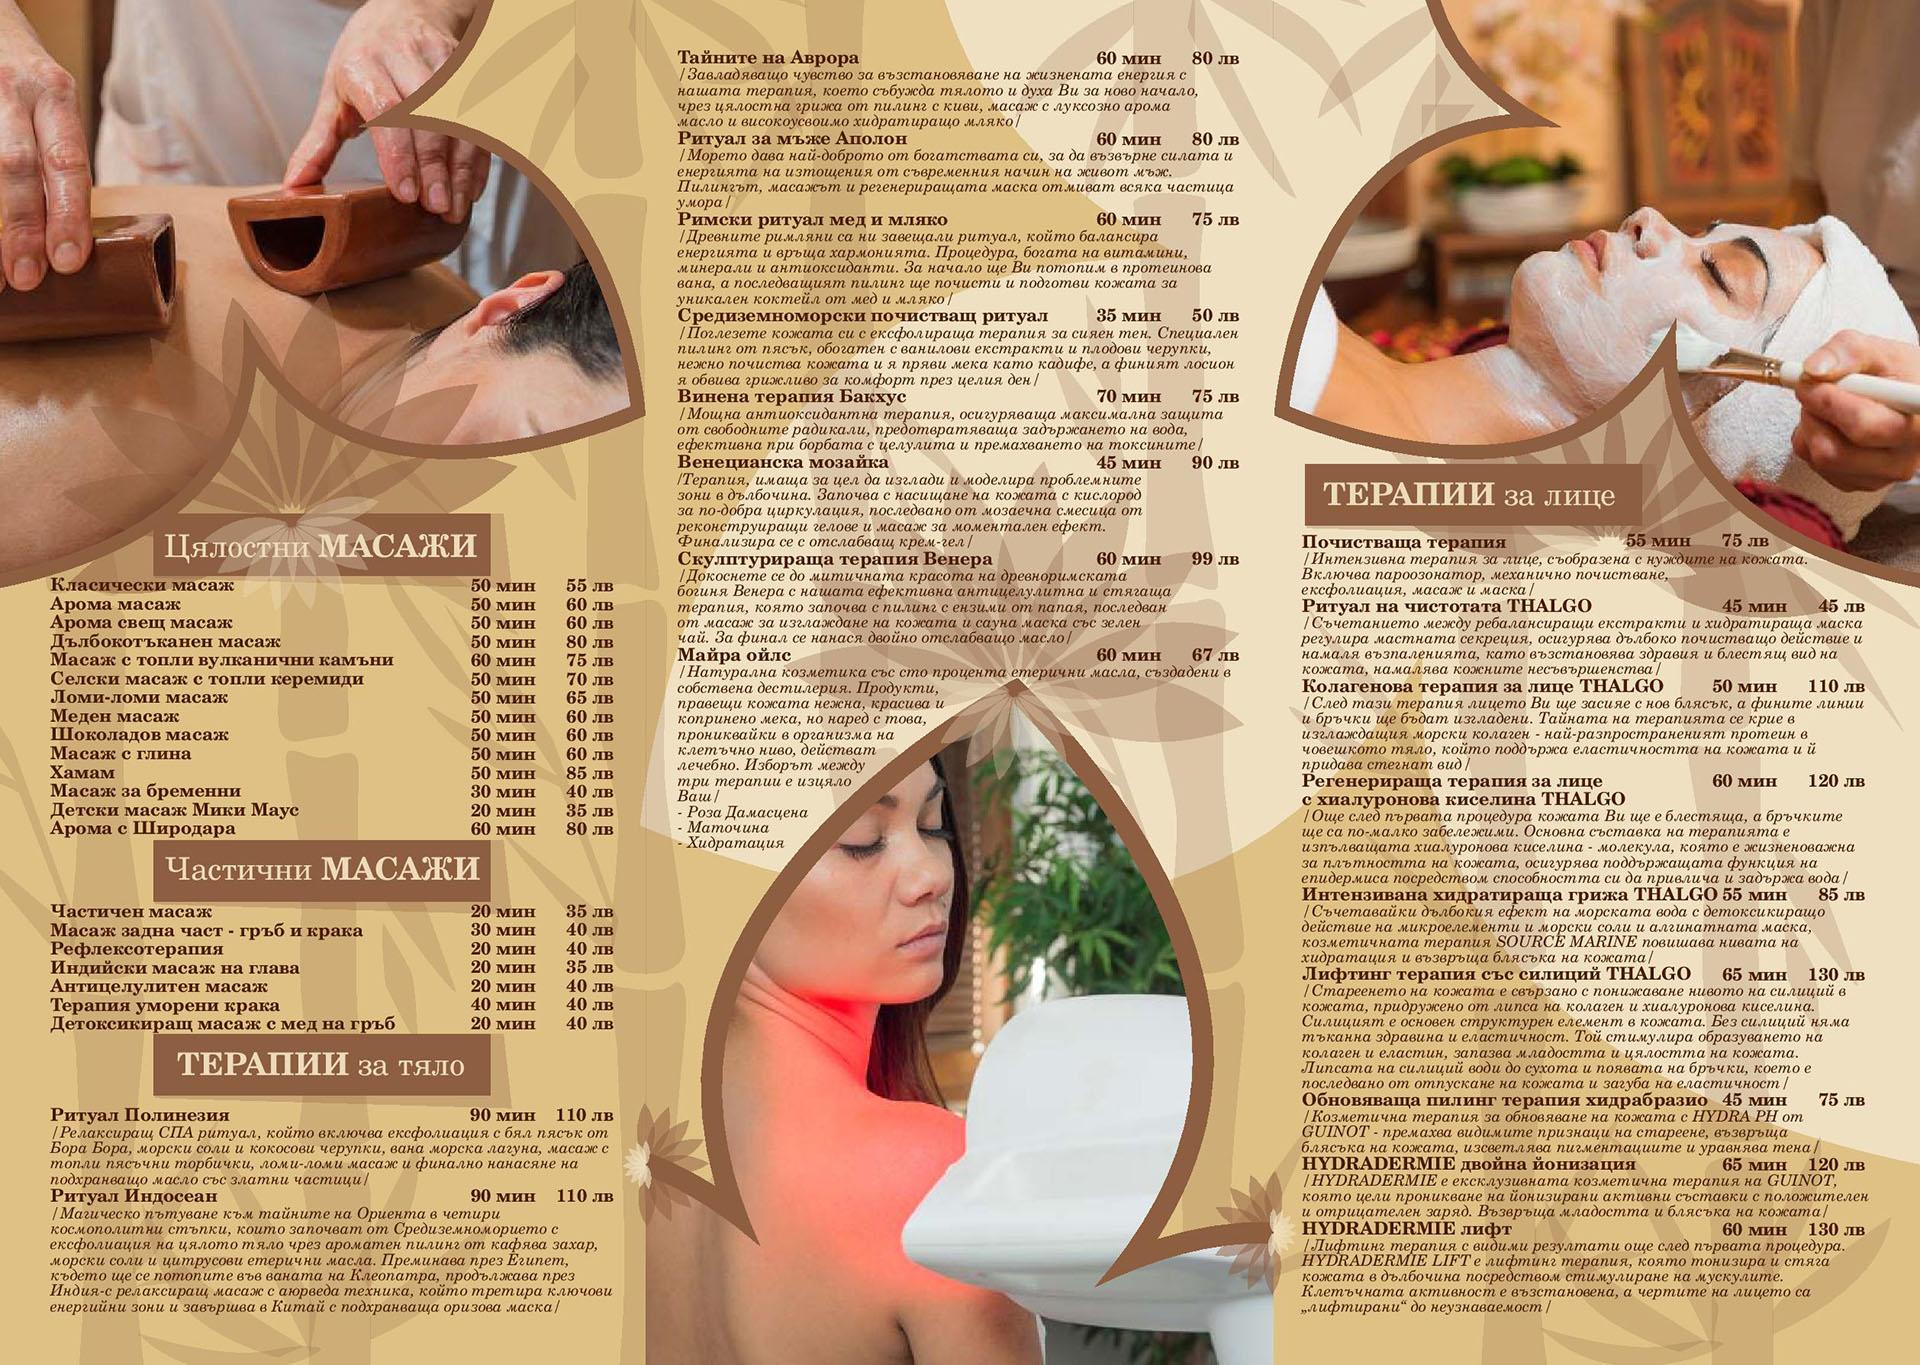 СПА-процедури-водни-процедури-масажи-терапии-за-тяло-терапии-за-лице-в-хотел-Спа-Клуб-Бор-Велинград